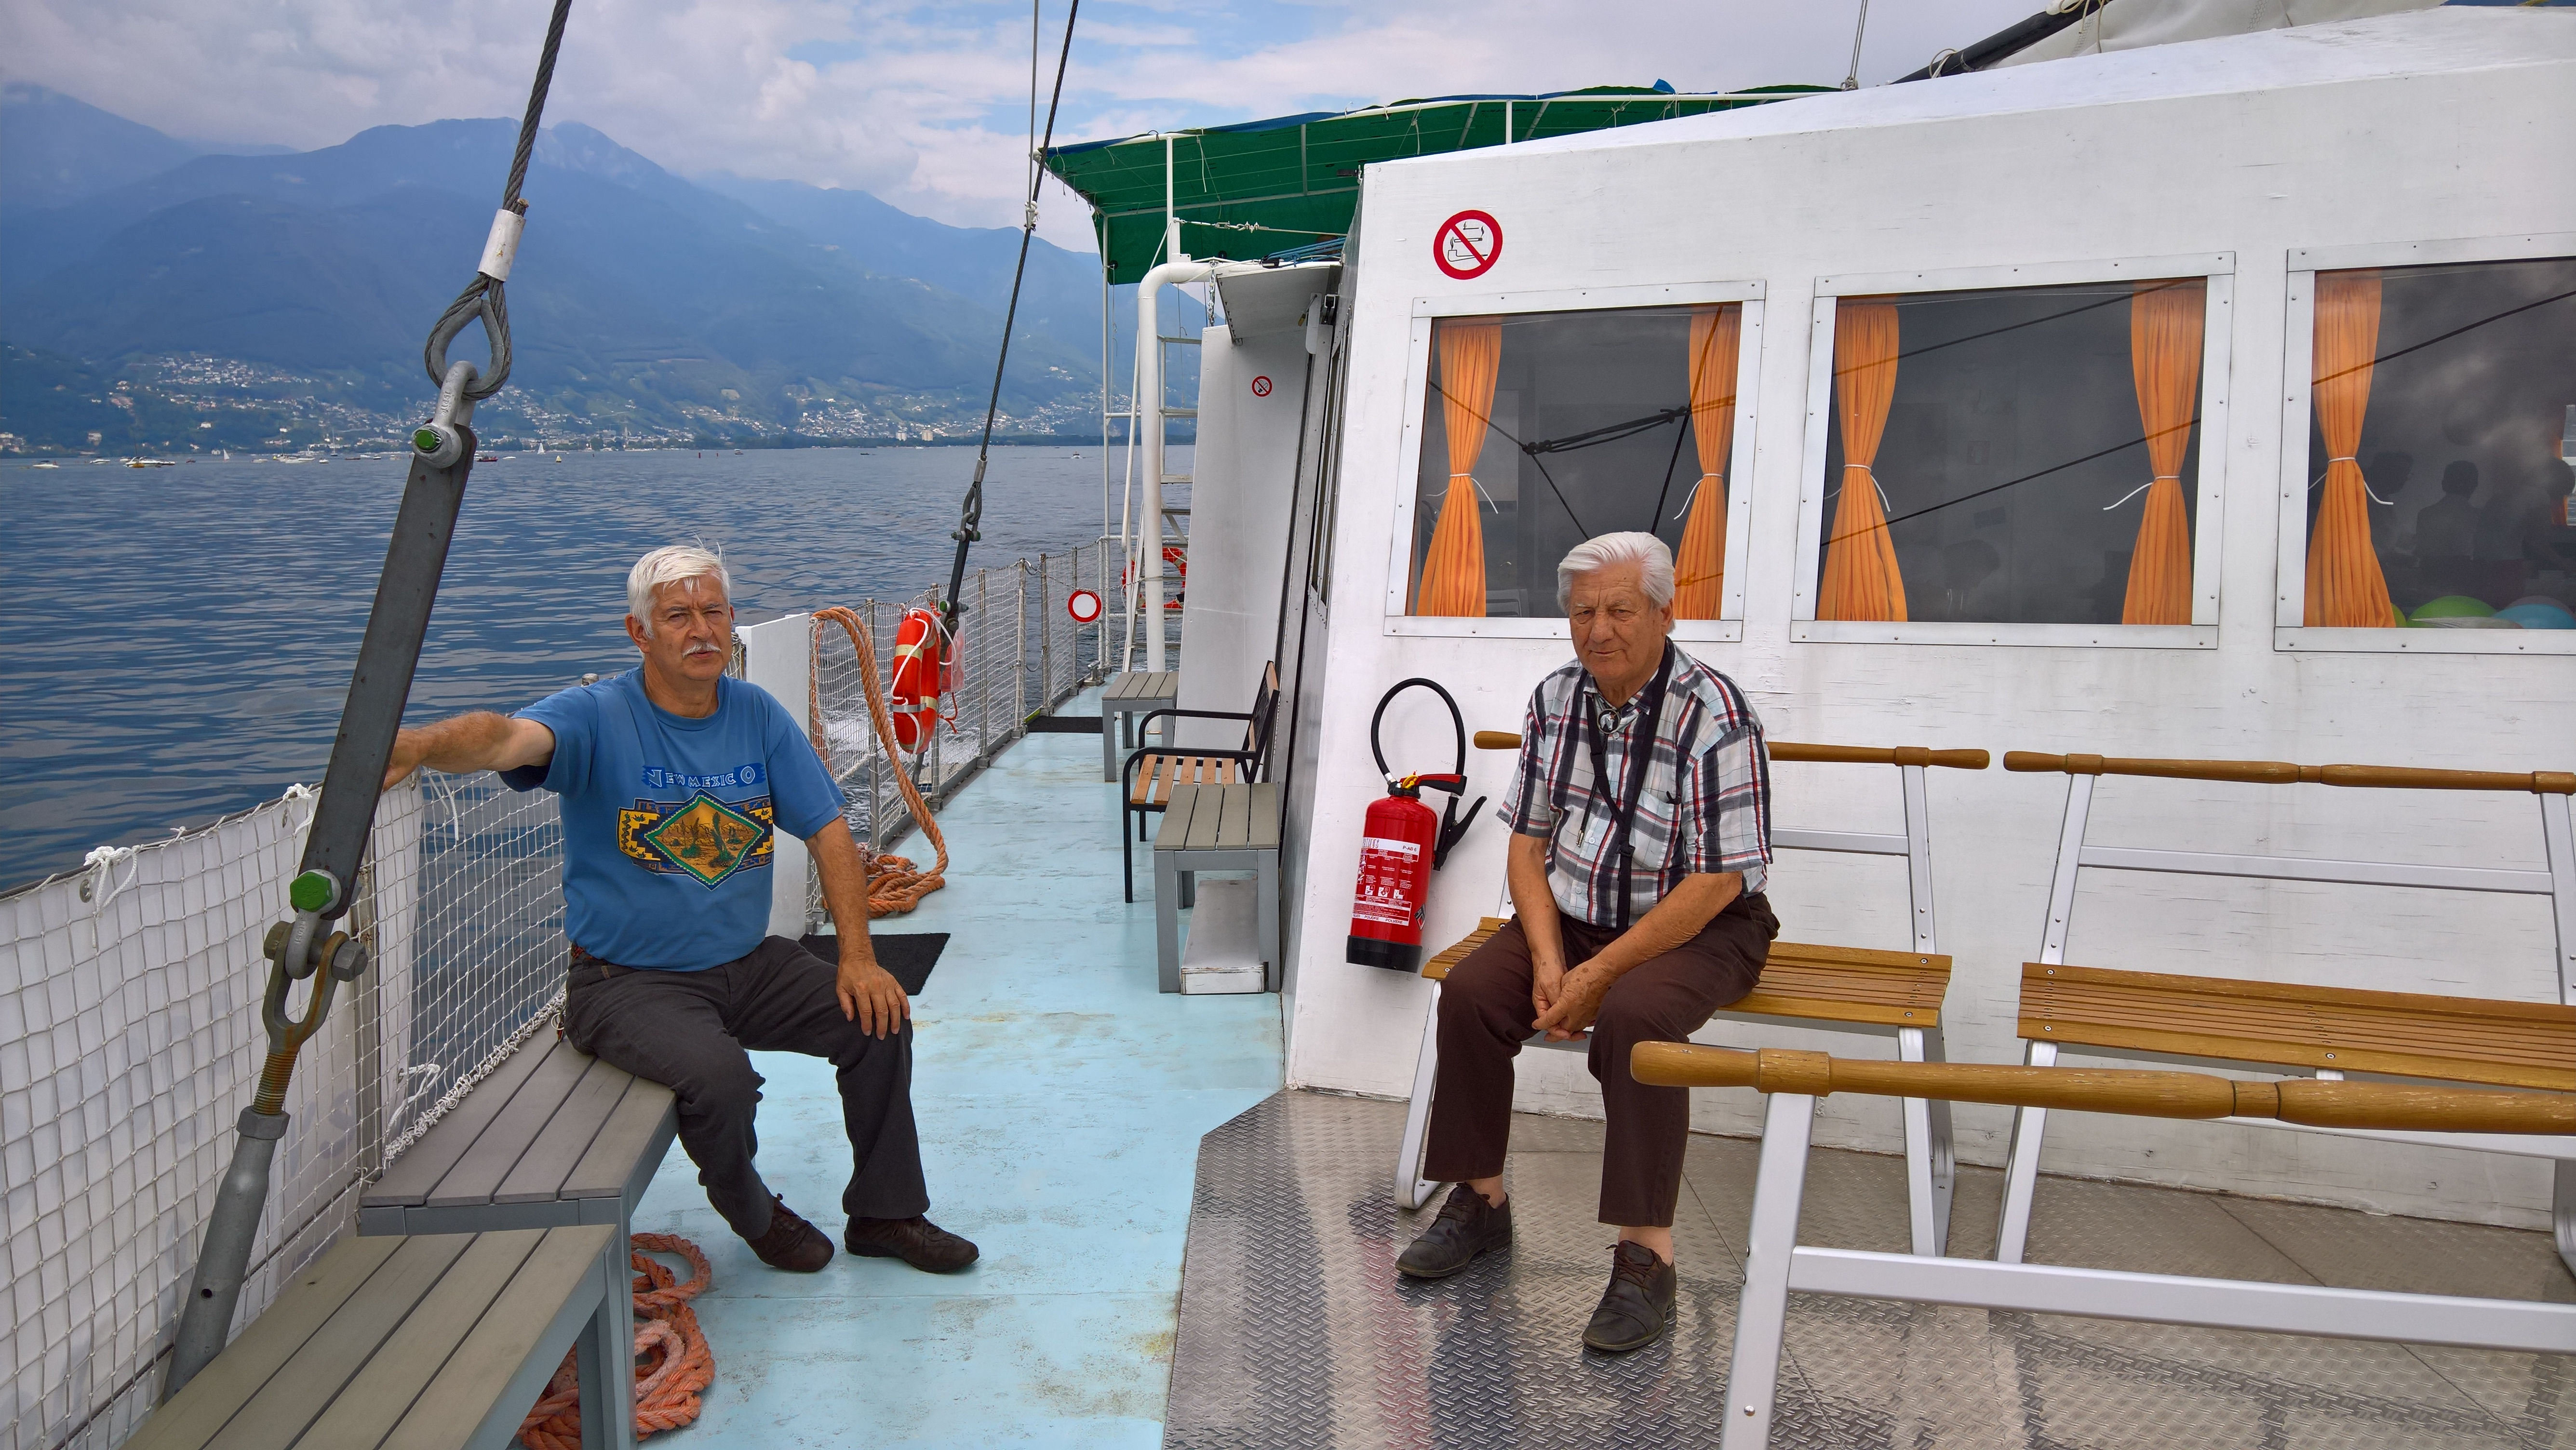 Ospiti a bordo